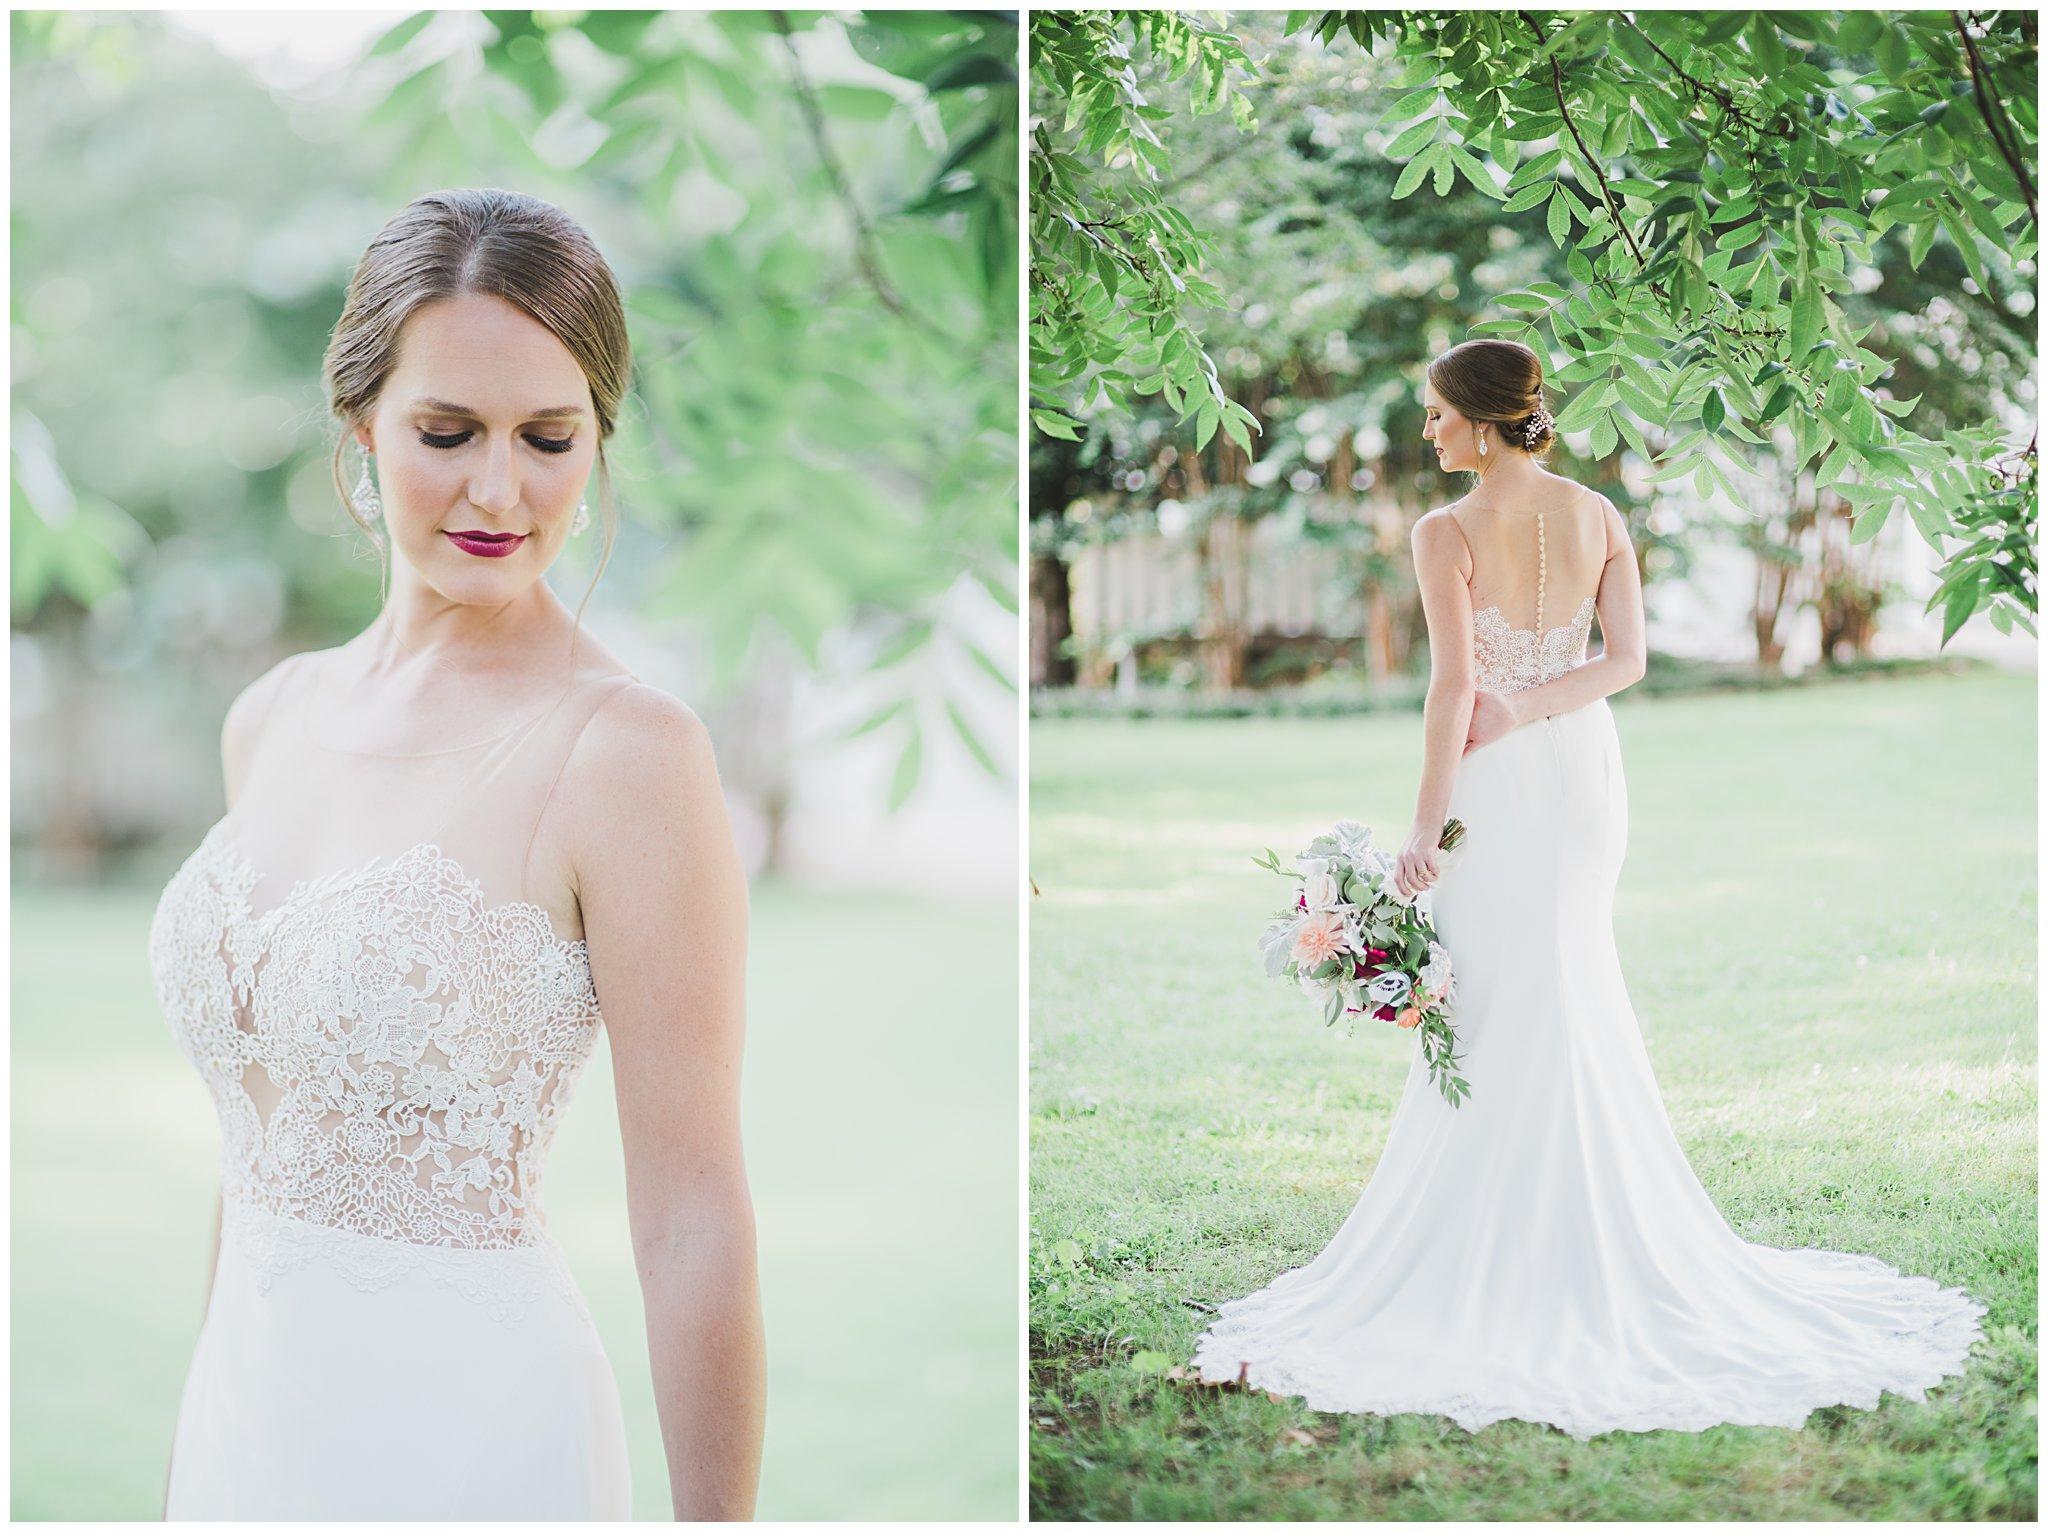 Elegant Garden Wedding Photo Shoot : Wedding Dress